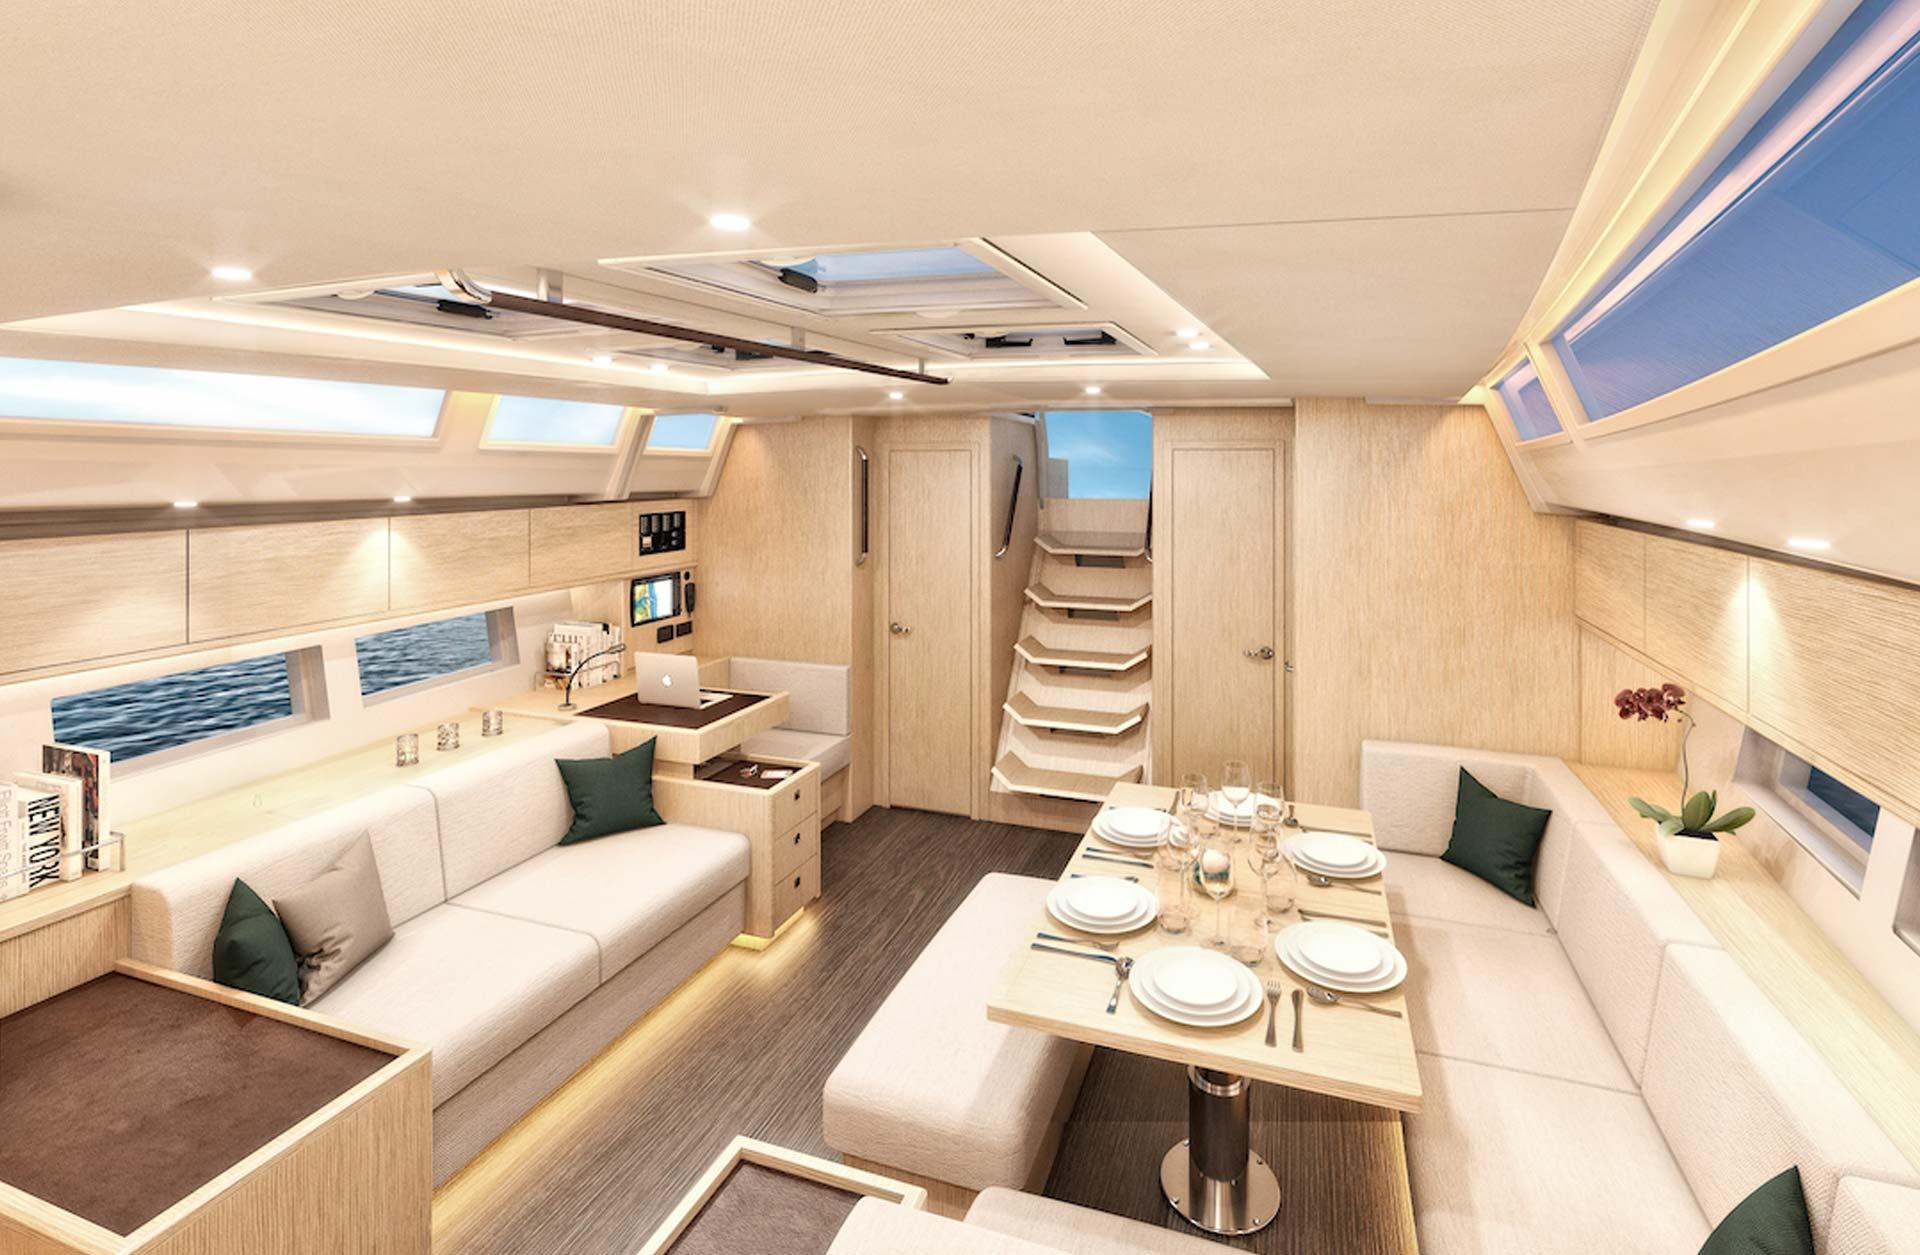 2018 C57 Boats for Sale - Interior